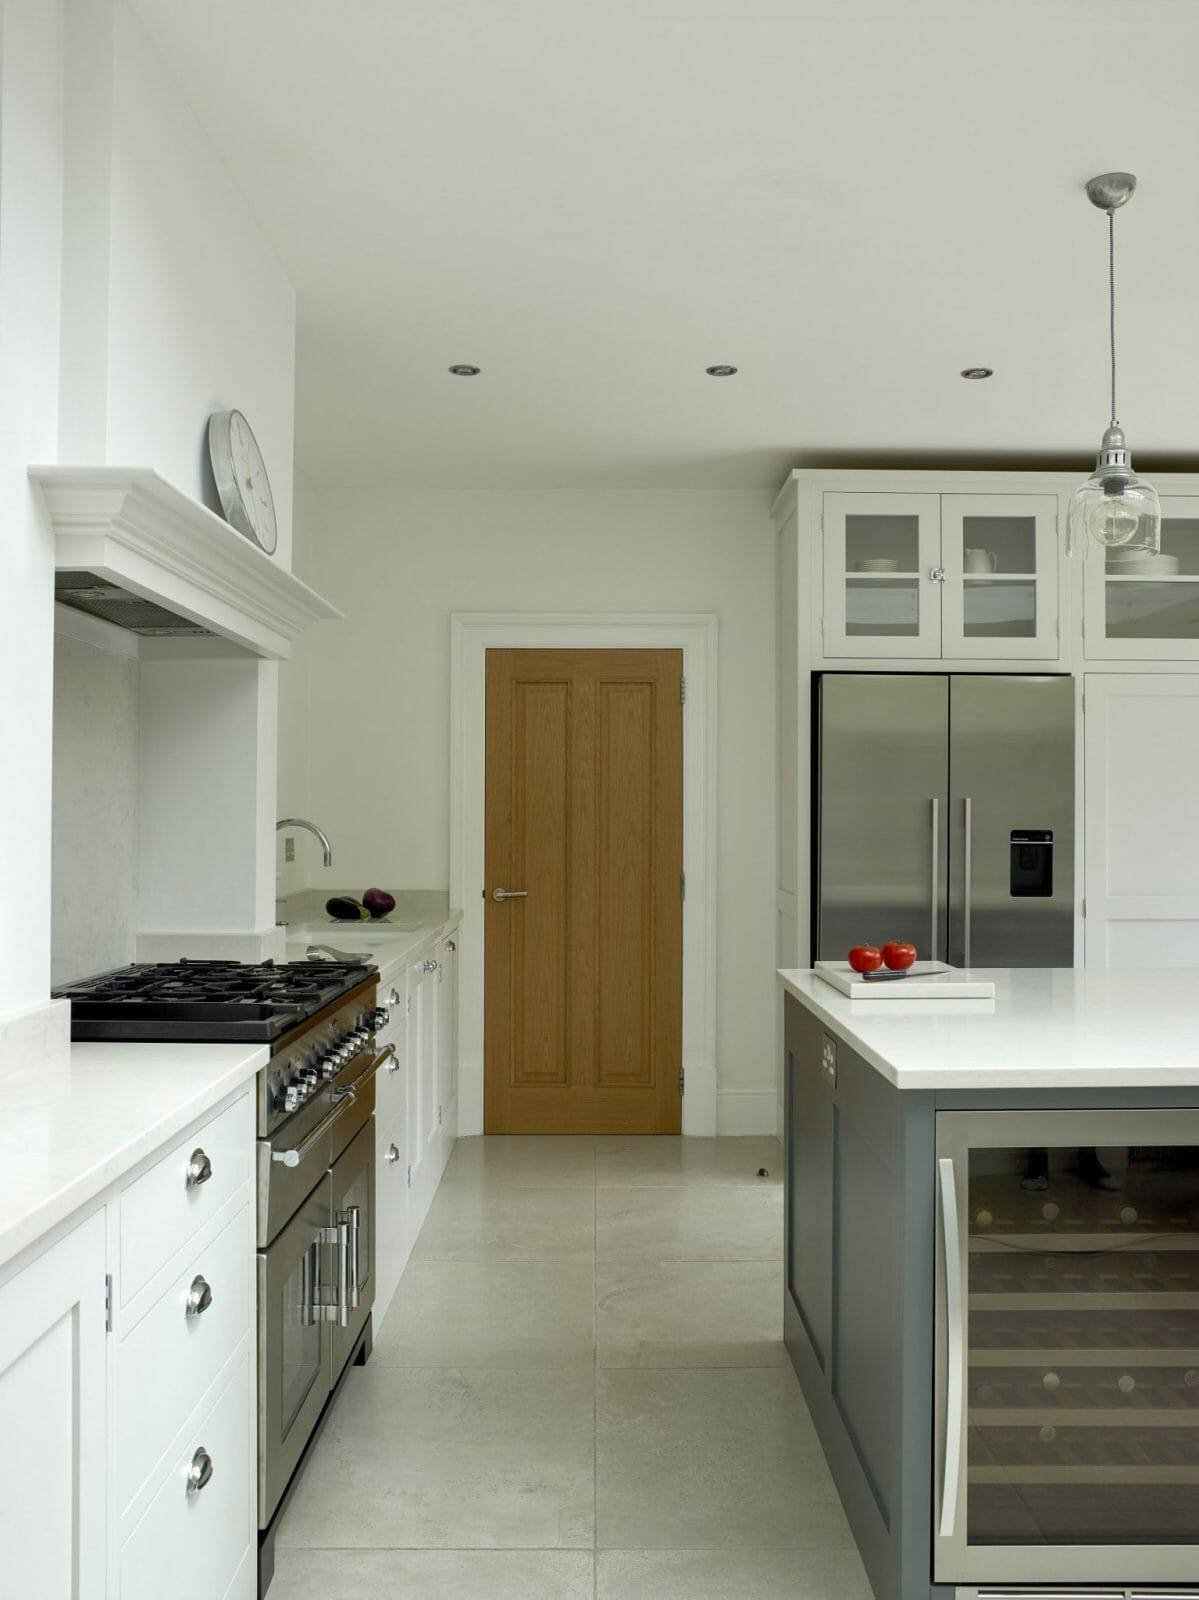 Hertford Hertfordshire Painted Shaker Kitchen Higham